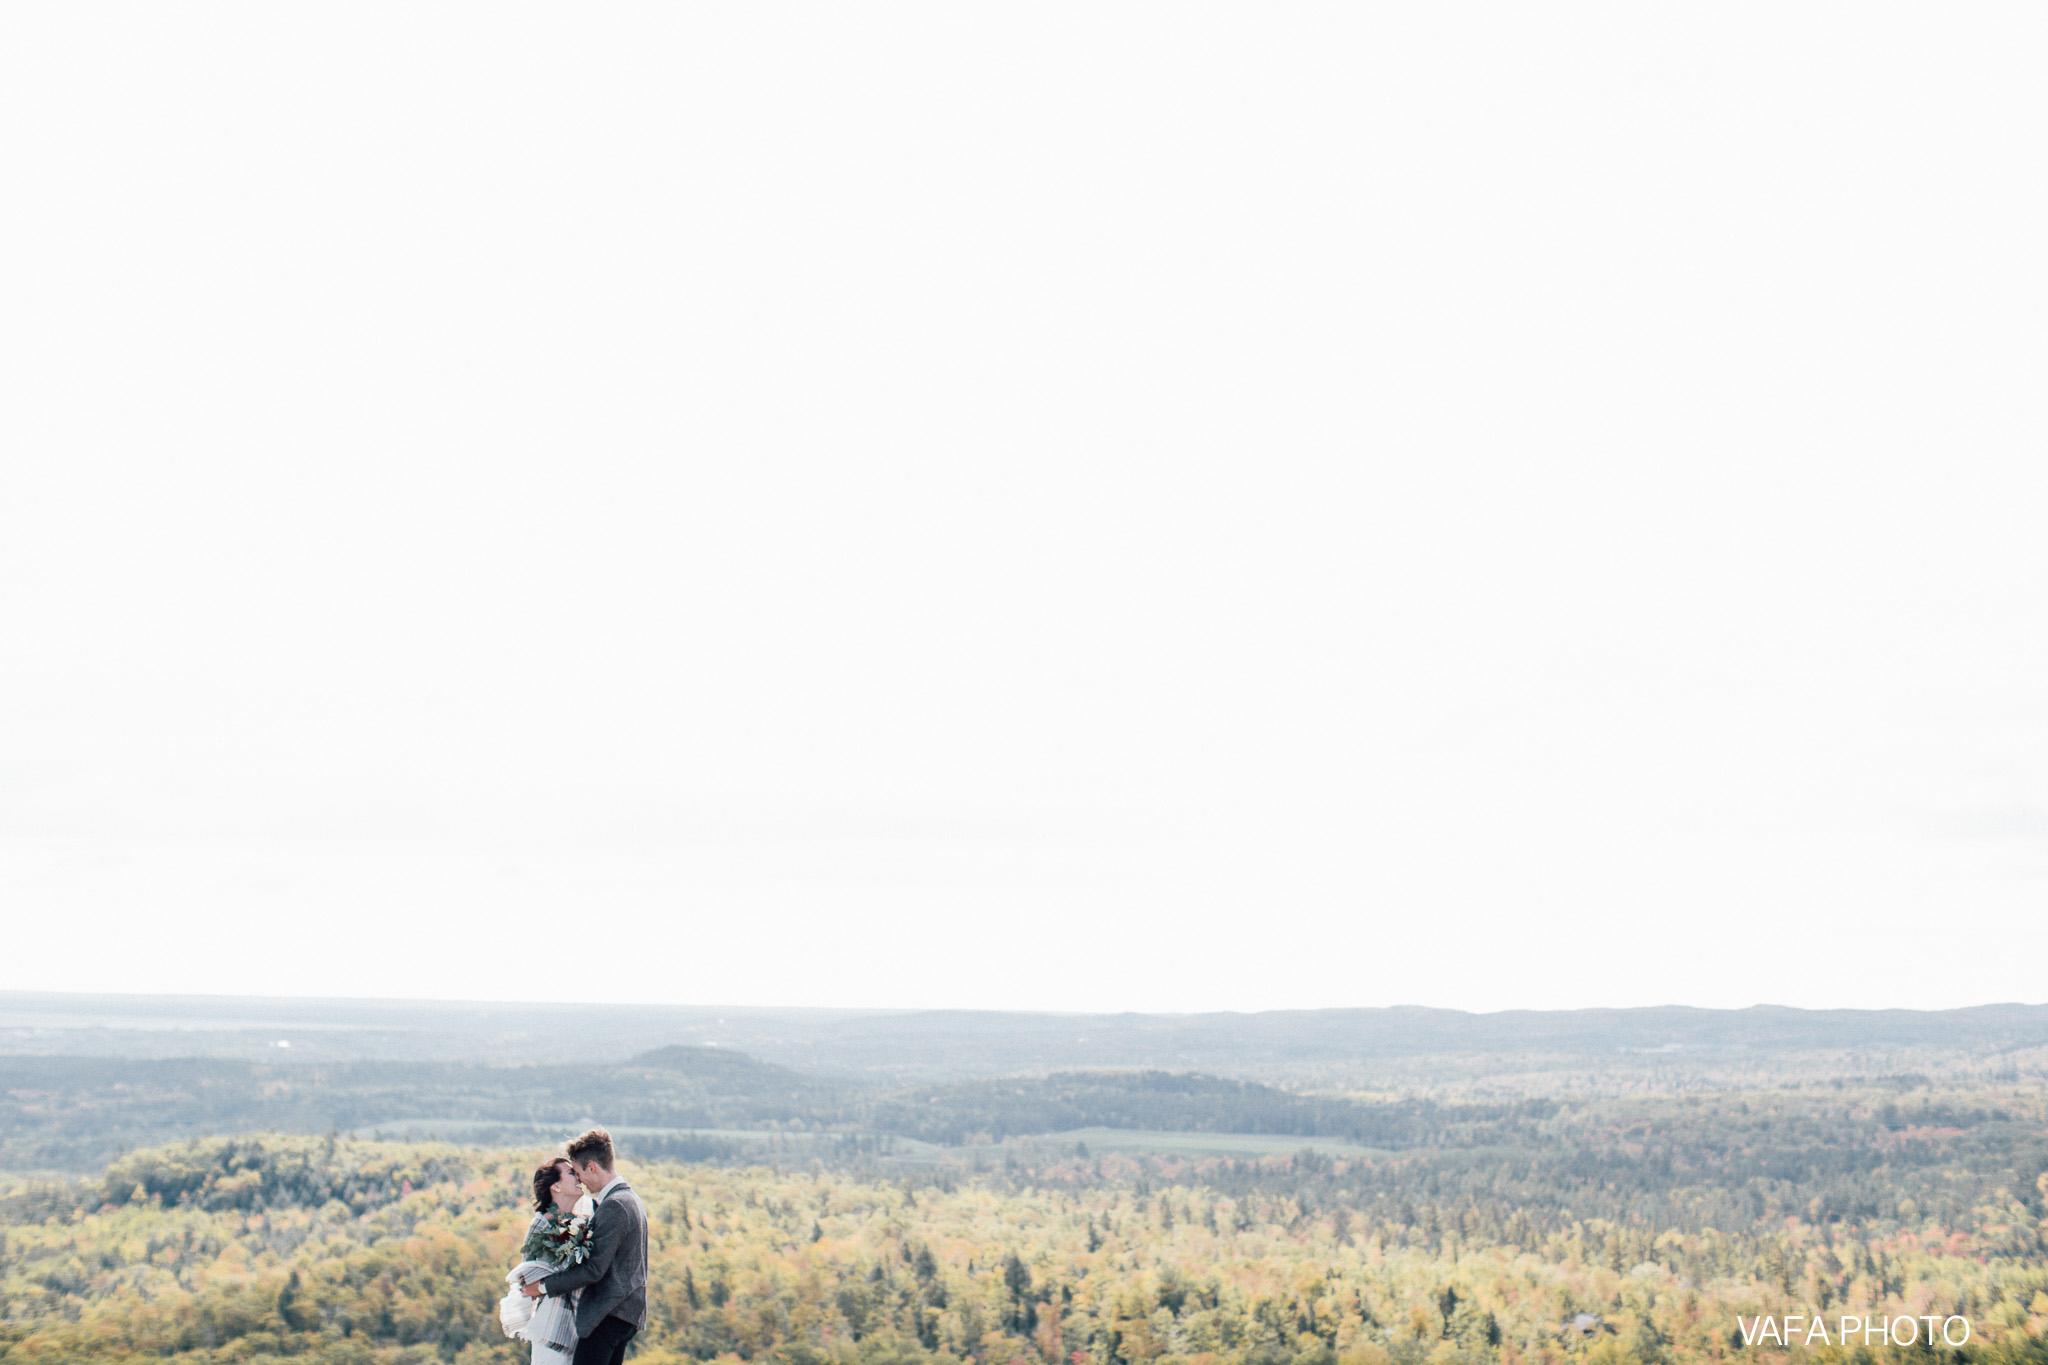 Hogback-Mountain-Wedding-Chelsea-Josh-Vafa-Photo-404.jpg